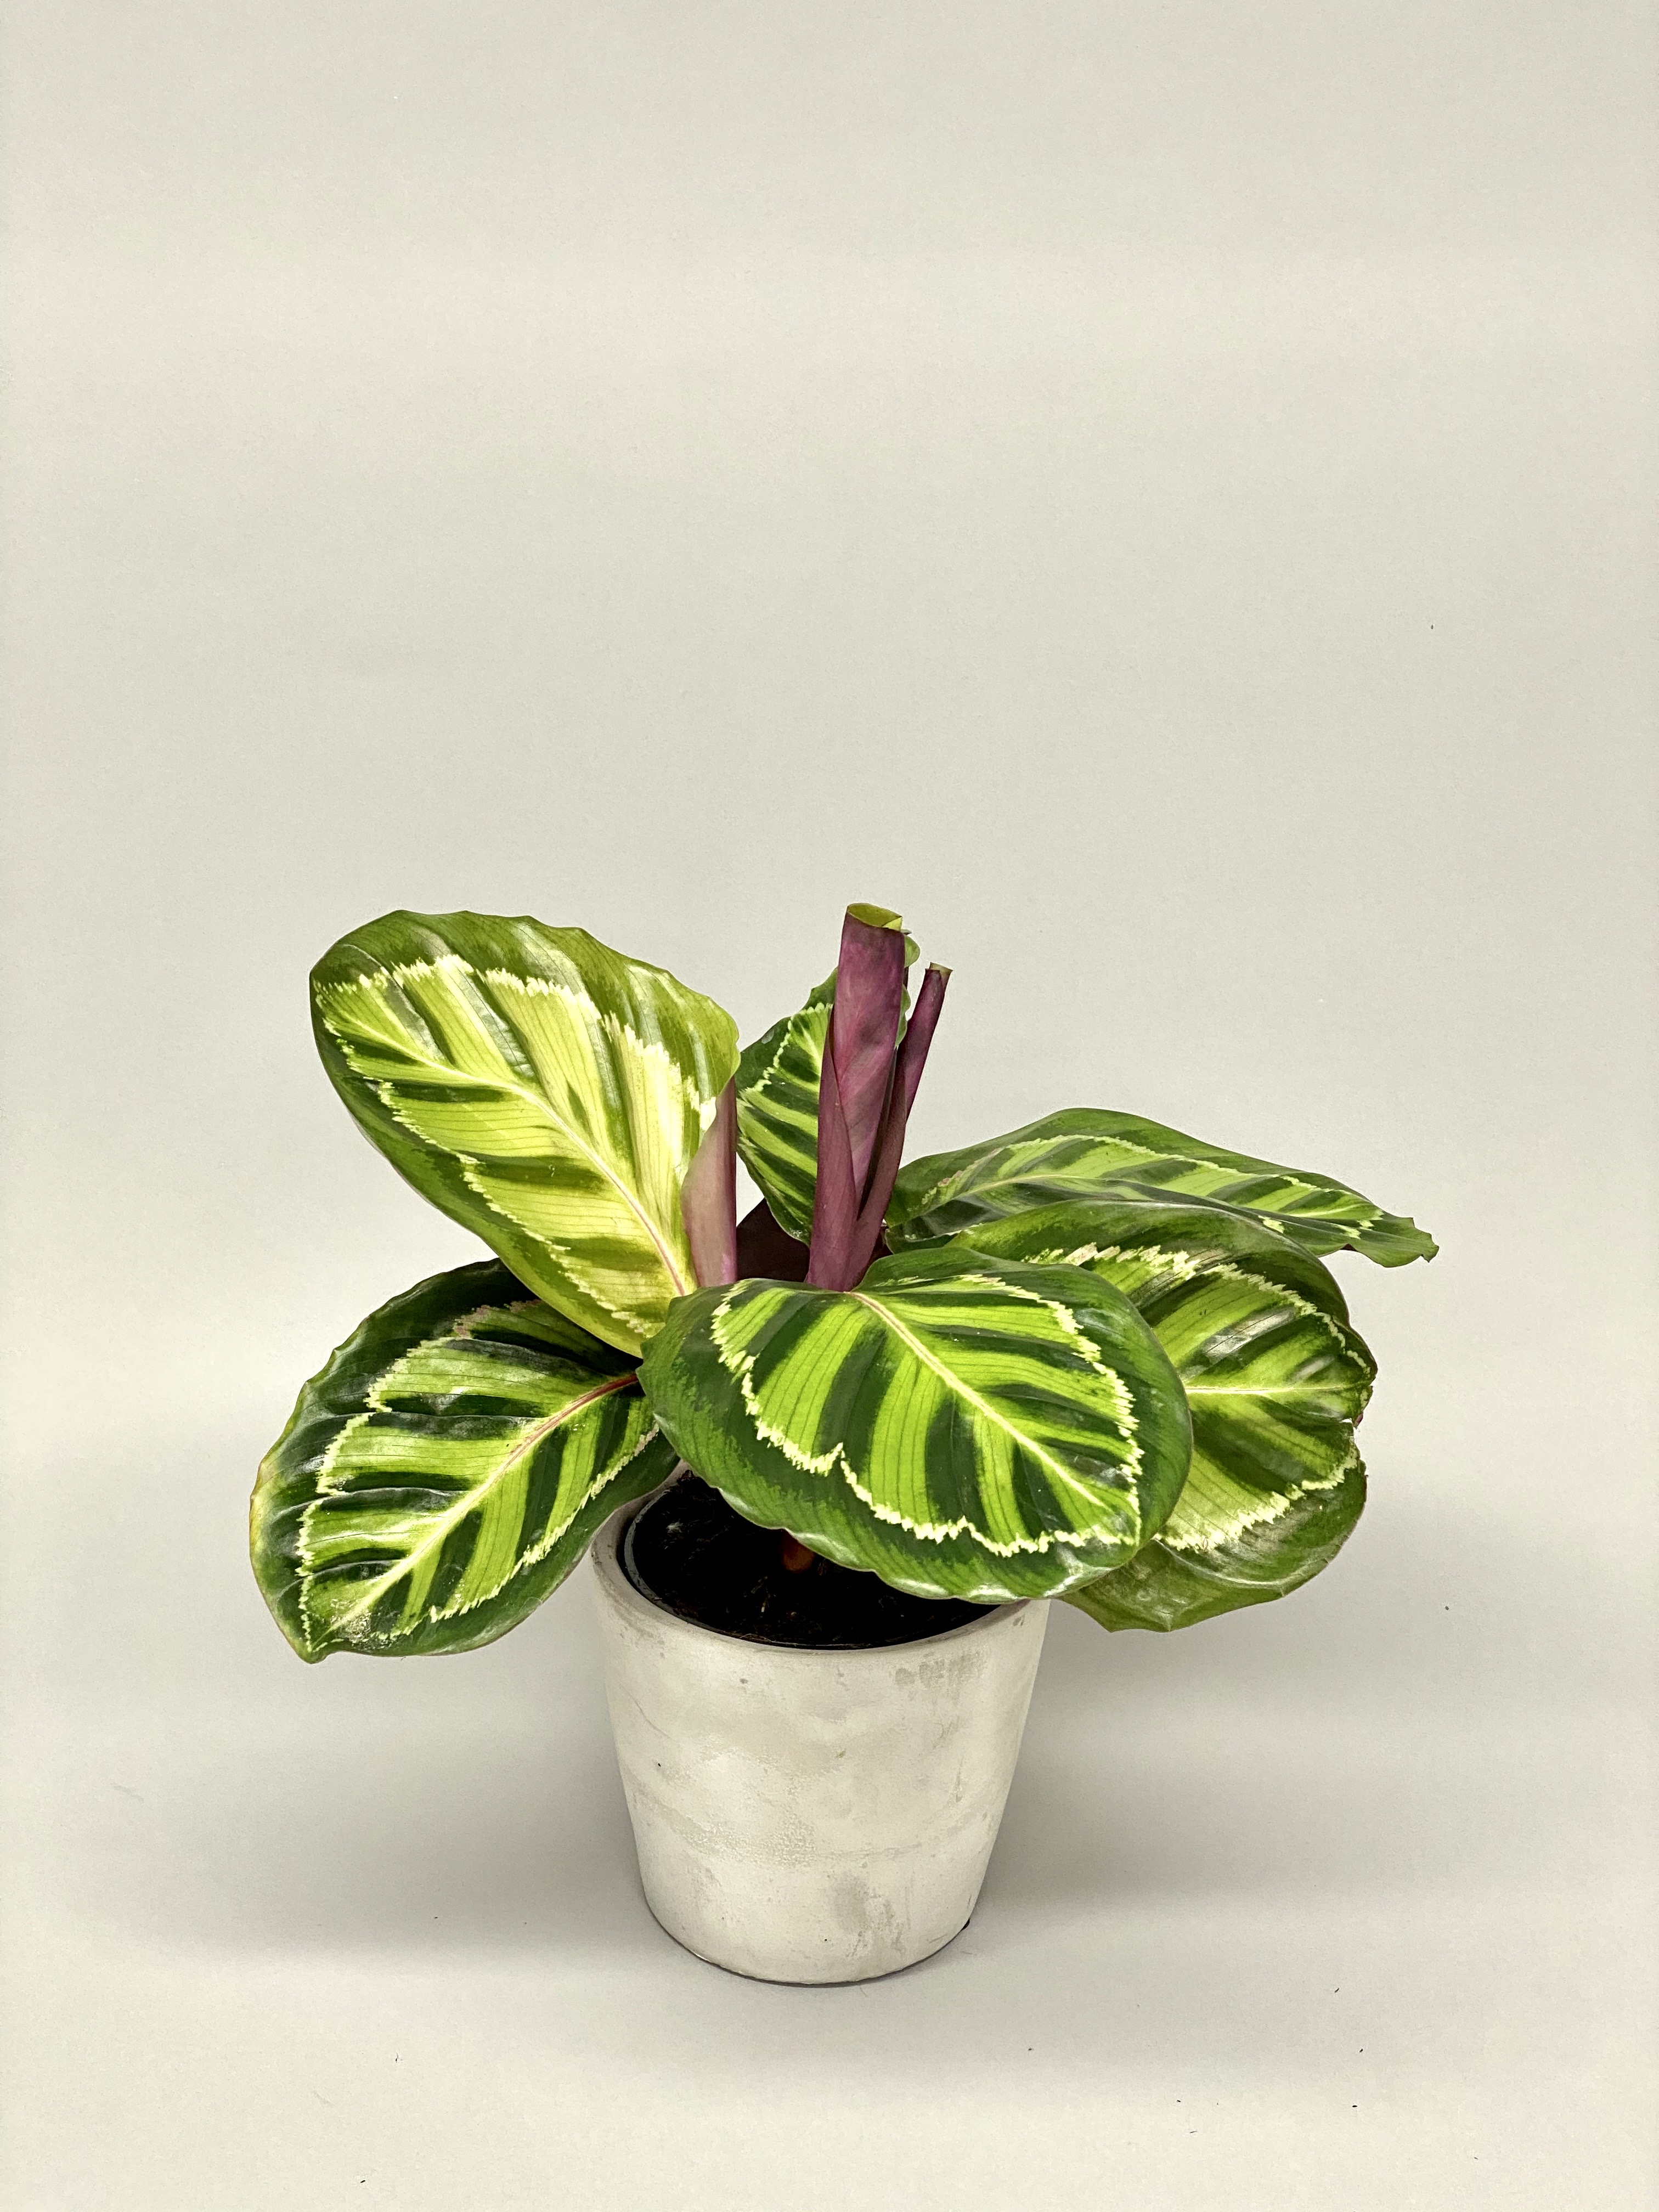 Calathea Roseopicta Illustris